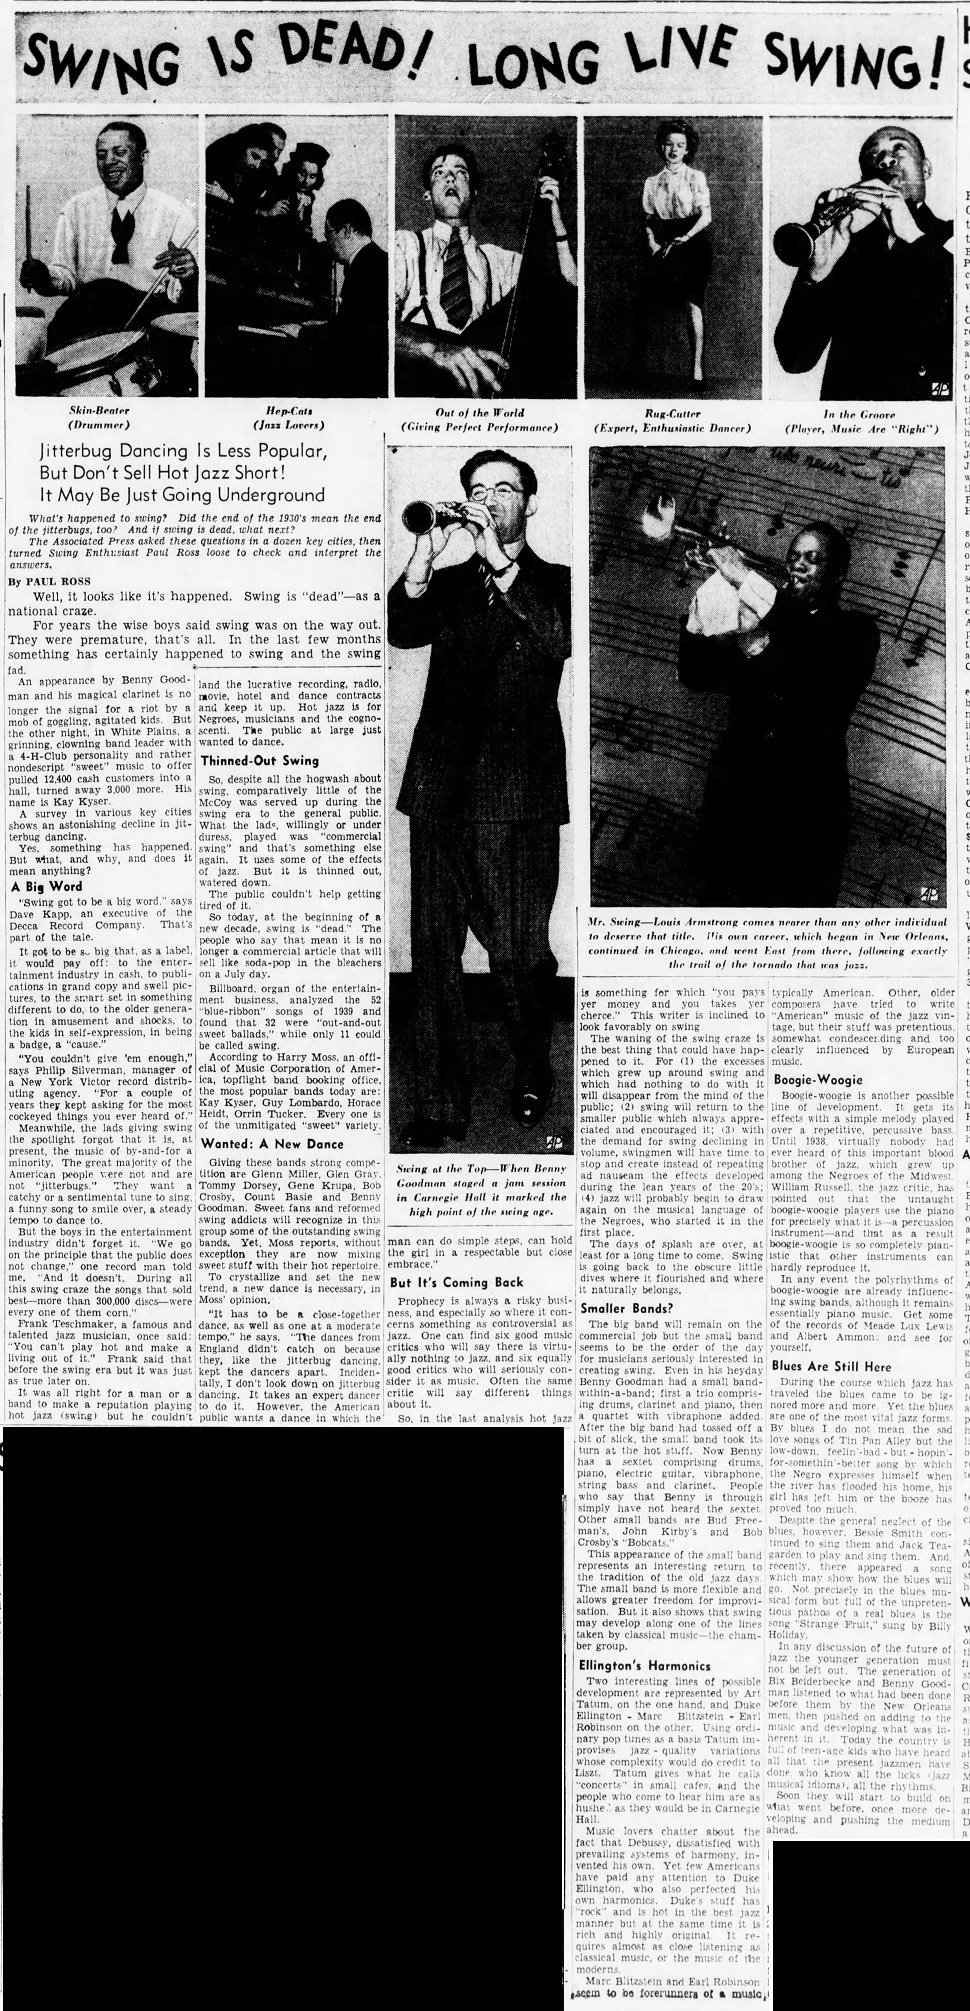 The_Brooklyn_Daily_Eagle_Tue__Feb_20__1940_(5).jpg